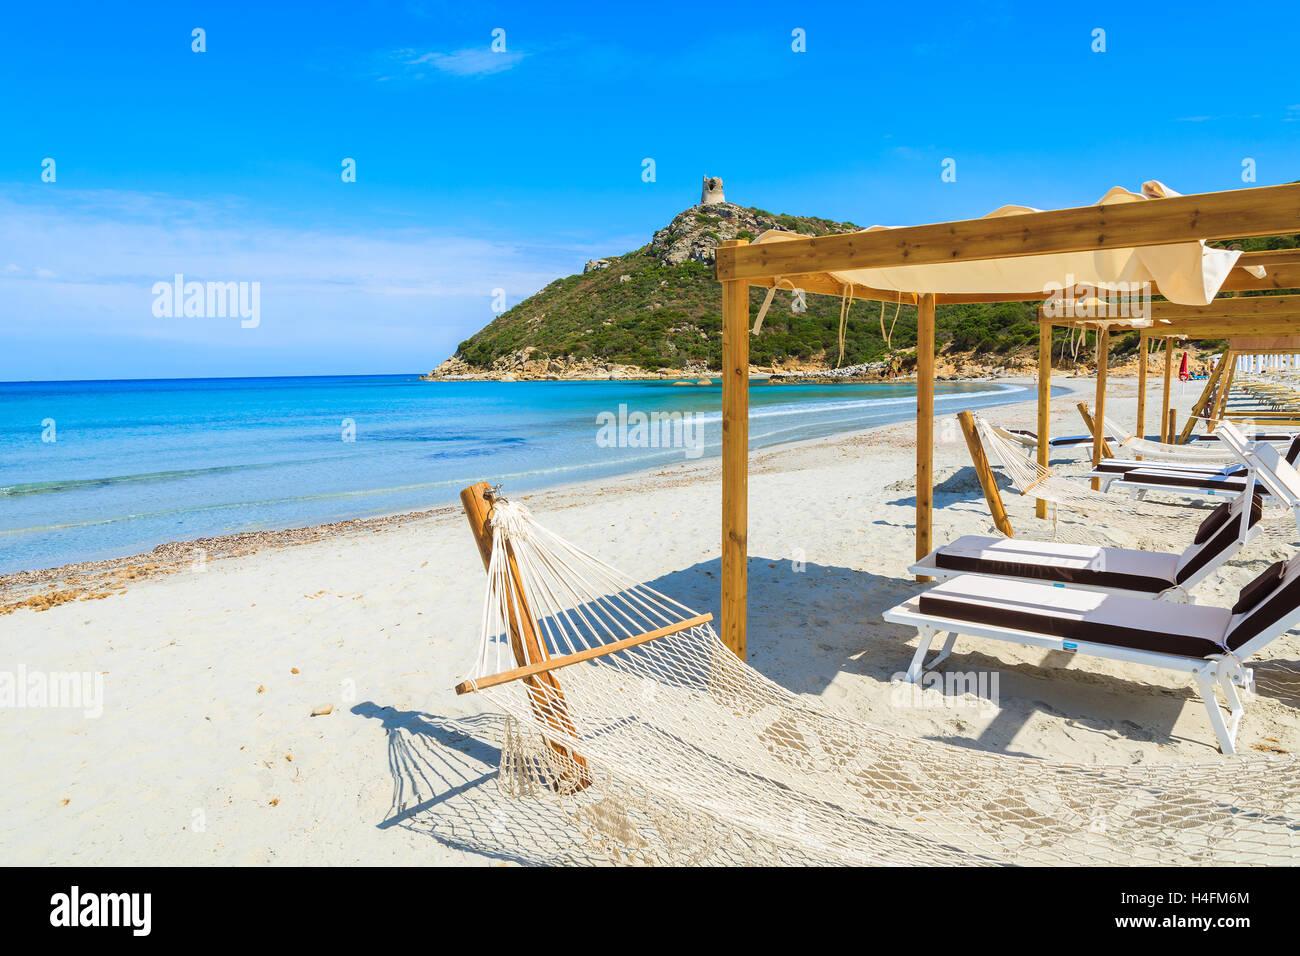 hammocks with sunchairs on white sand beach in porto giunco bay sardinia island italy hammocks with sunchairs on white sand beach in porto giunco bay      rh   alamy